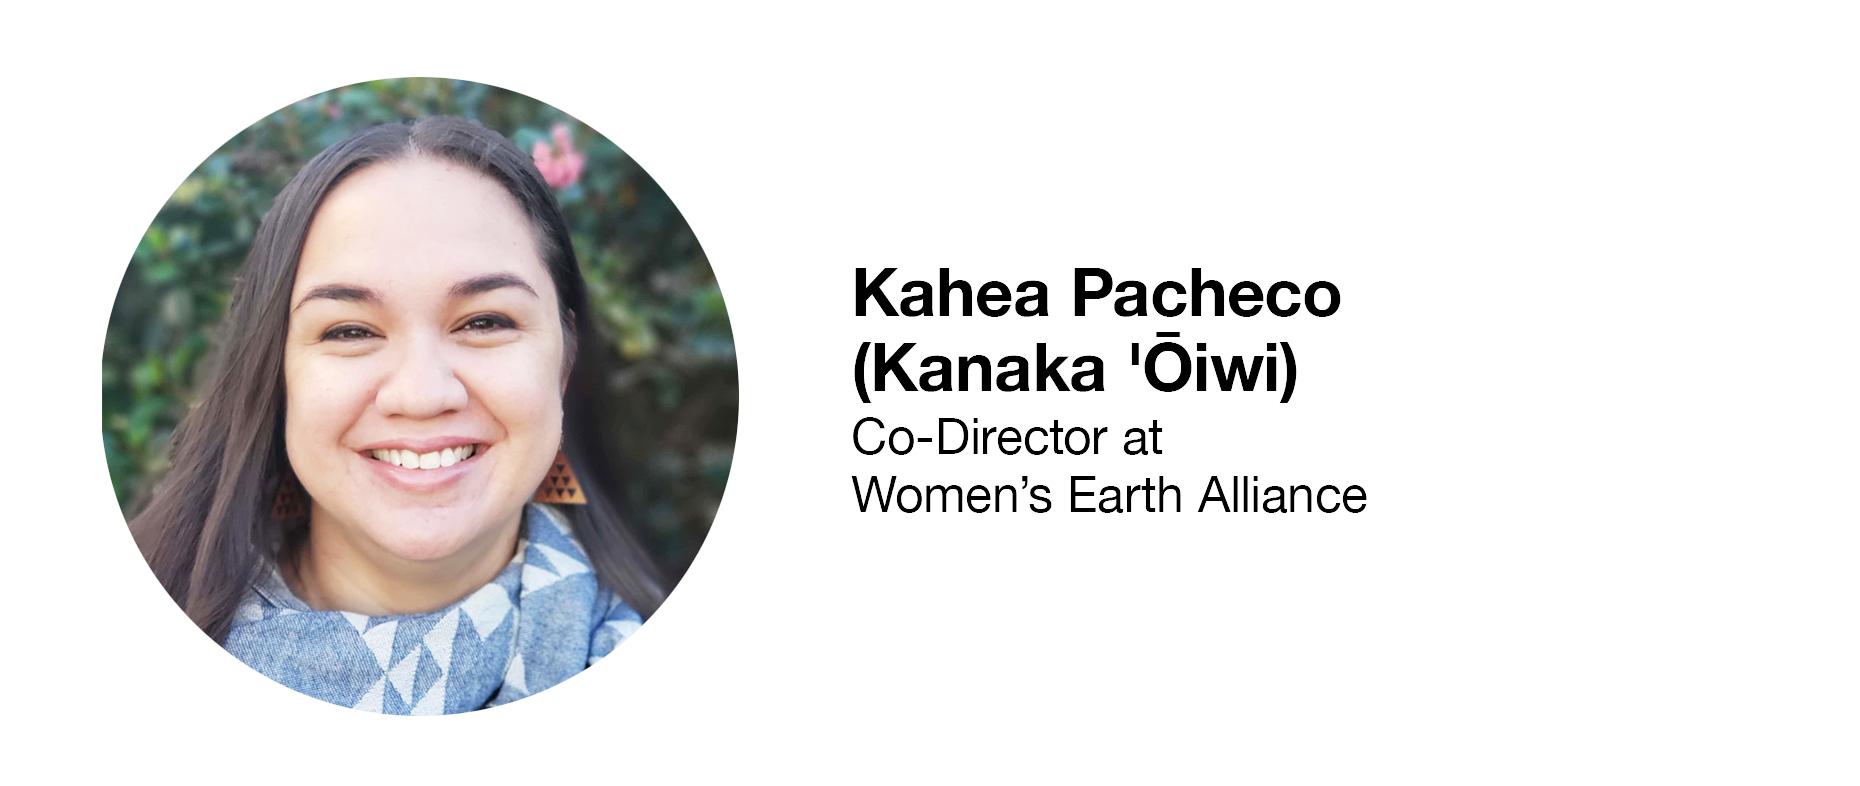 Kahea Pacheco (Kanaka 'Ōiwi)  Co-Director at Women's Earth Alliance